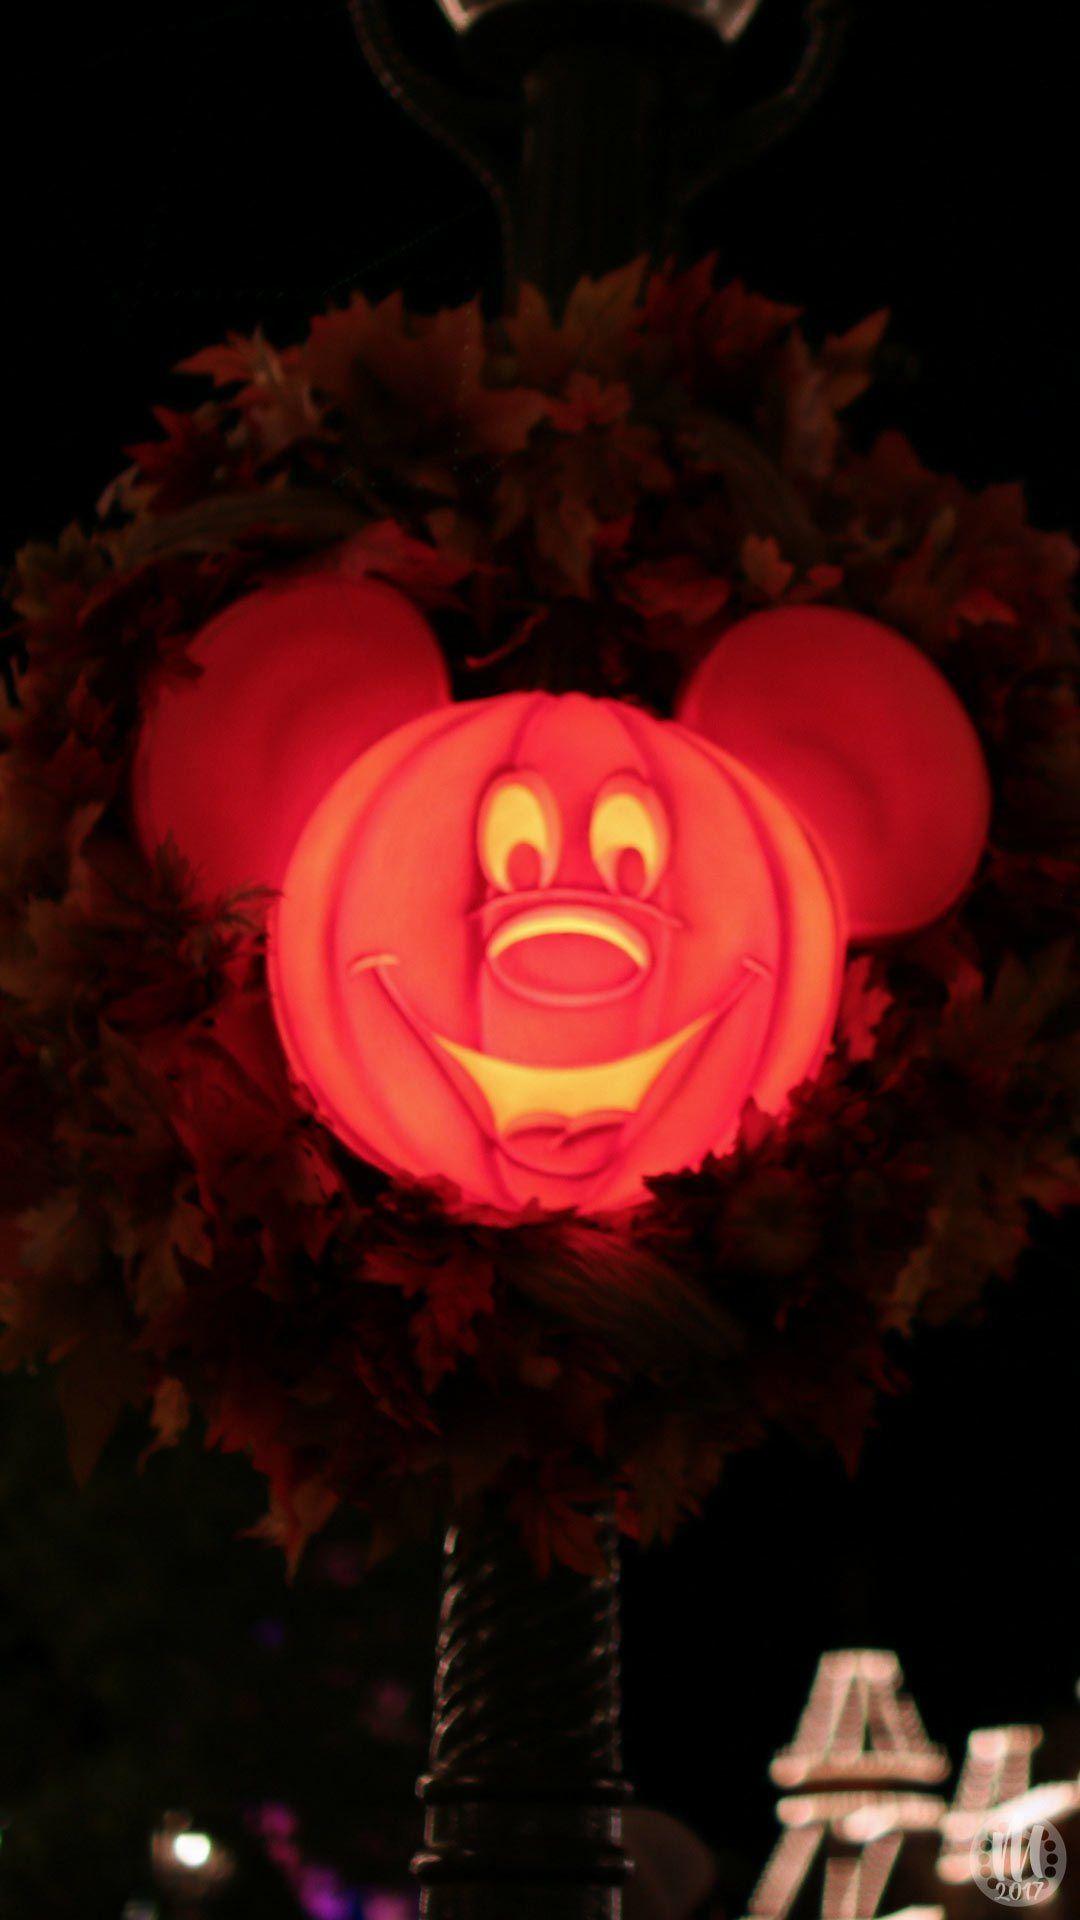 Android Disney Disneyphonebackgrounds Halloween Phonebackgroundsdisneyhalloween Wallpape In 2020 Halloween Wallpaper Android Wallpaper Halloween Wallpaper Iphone